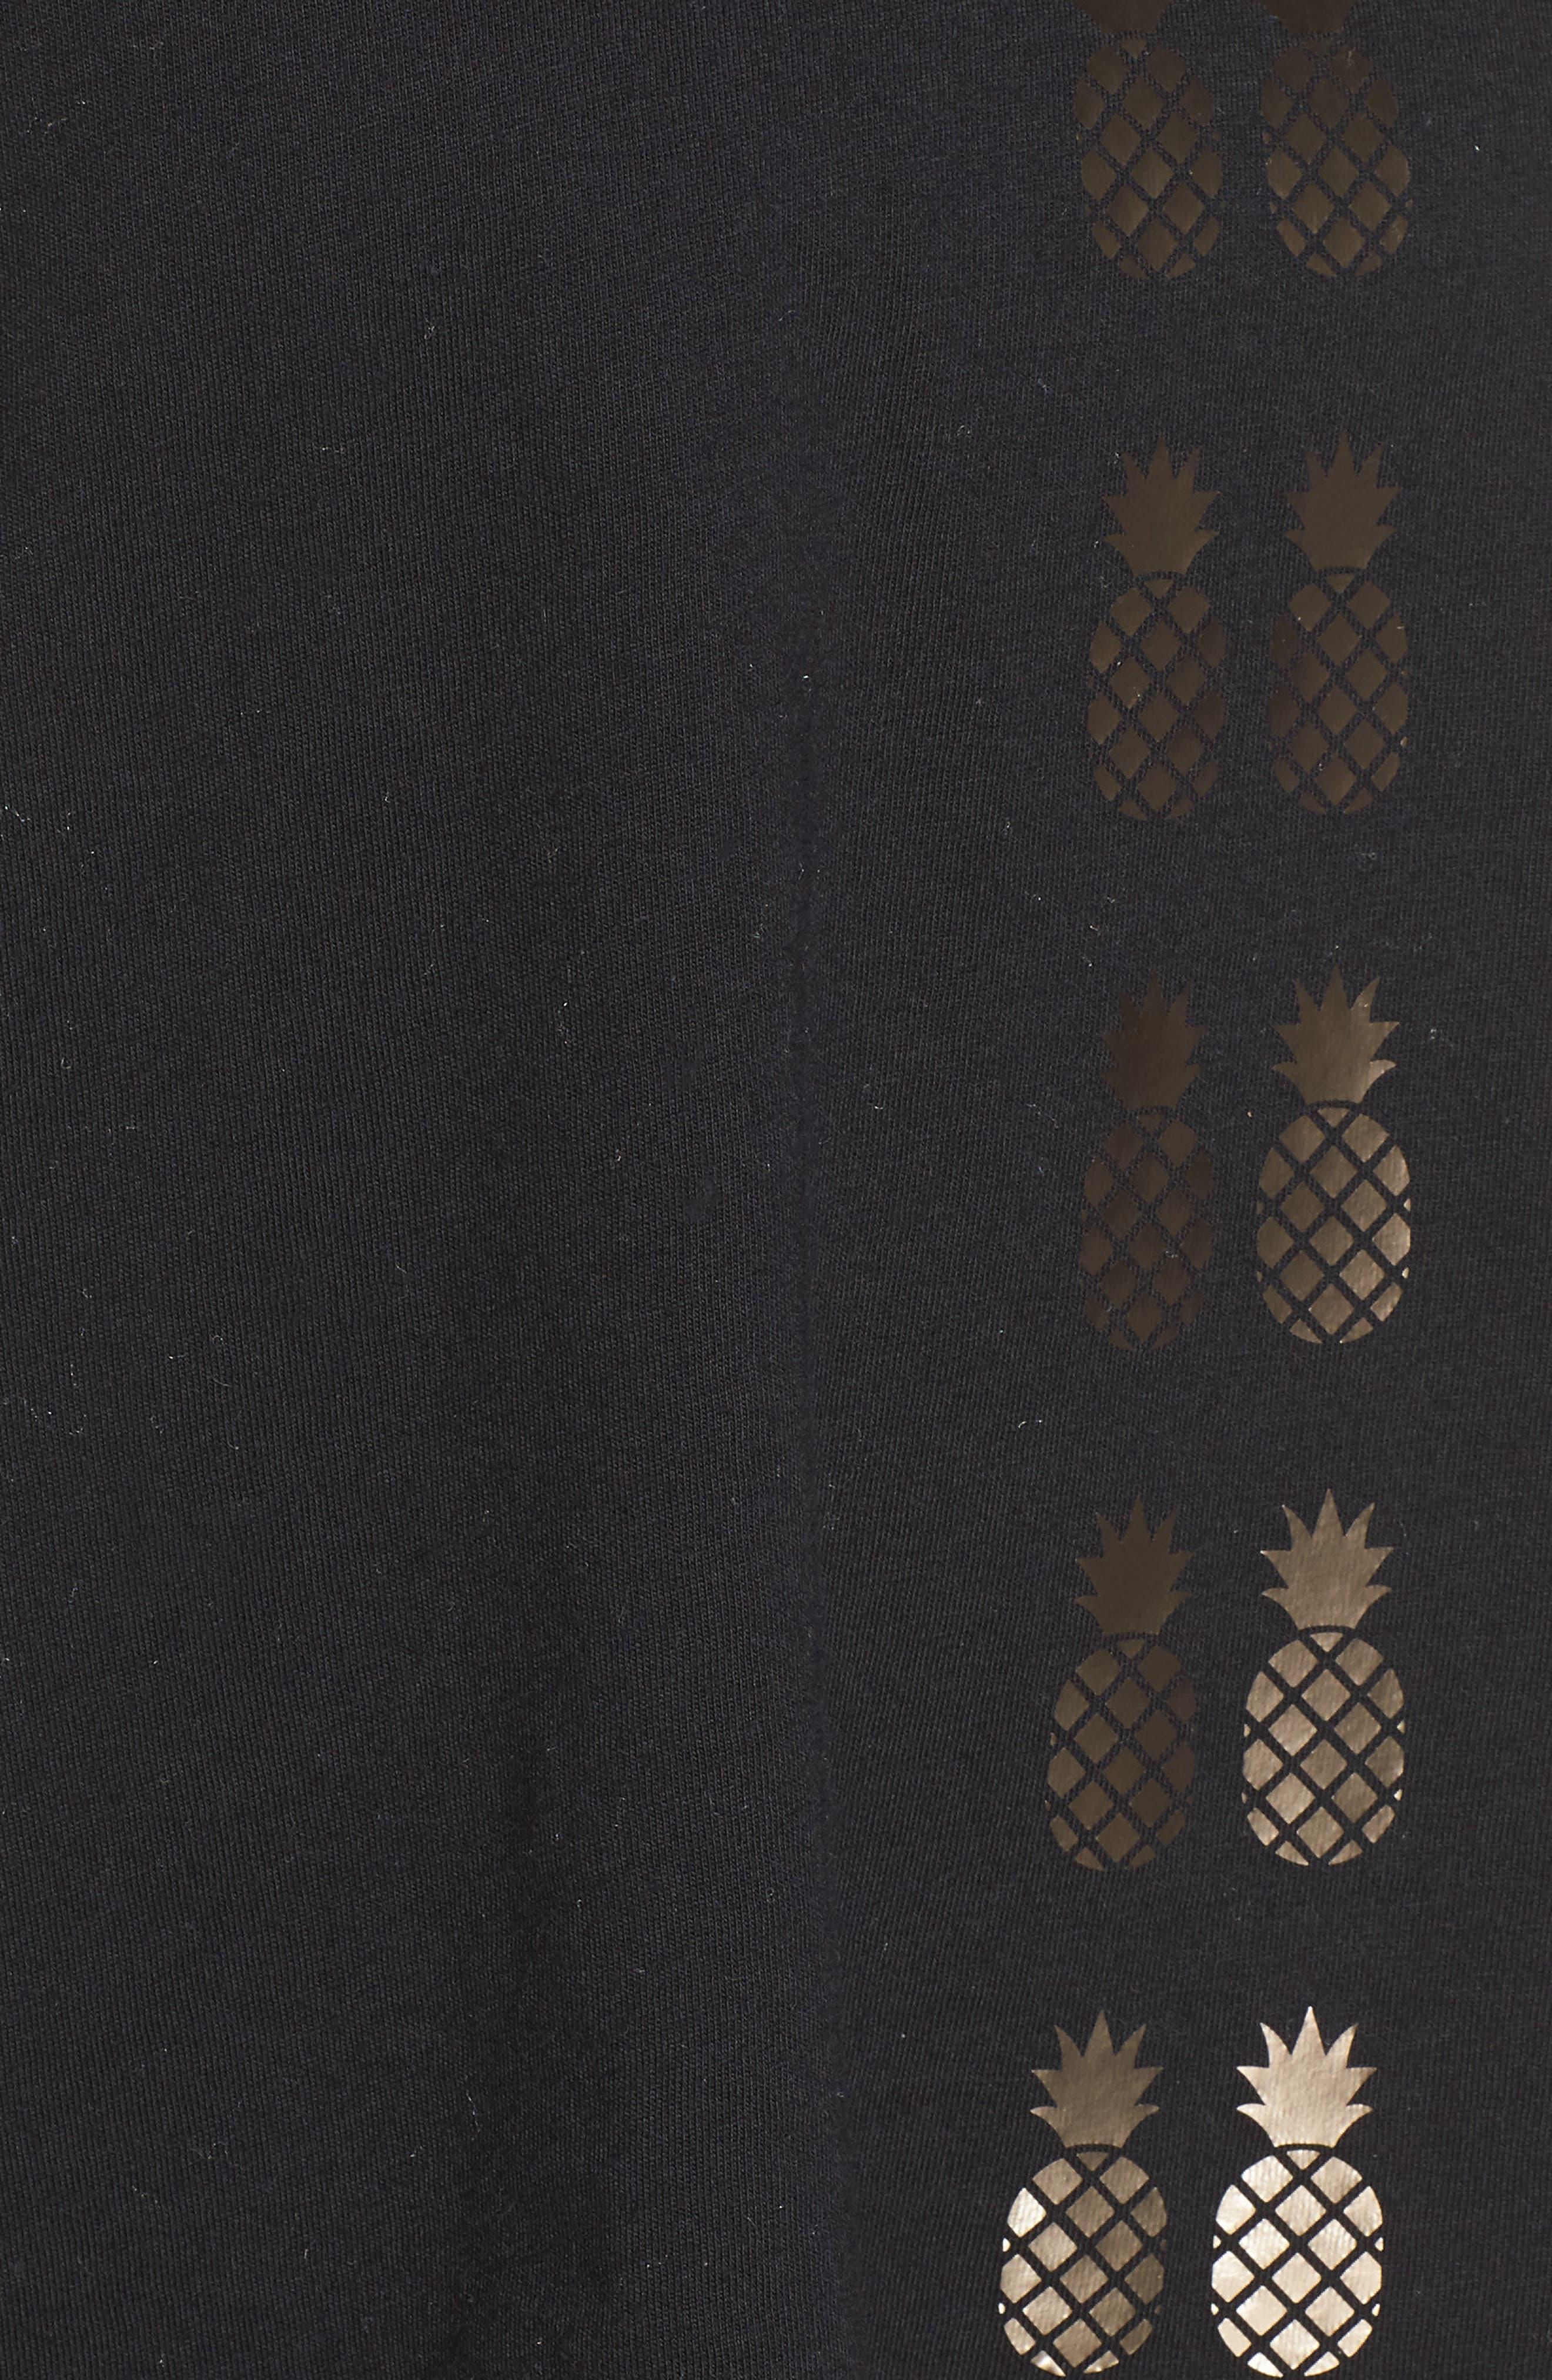 Flash Pineapple Racerback Tank,                             Alternate thumbnail 6, color,                             Nero/ Iridescent Gold